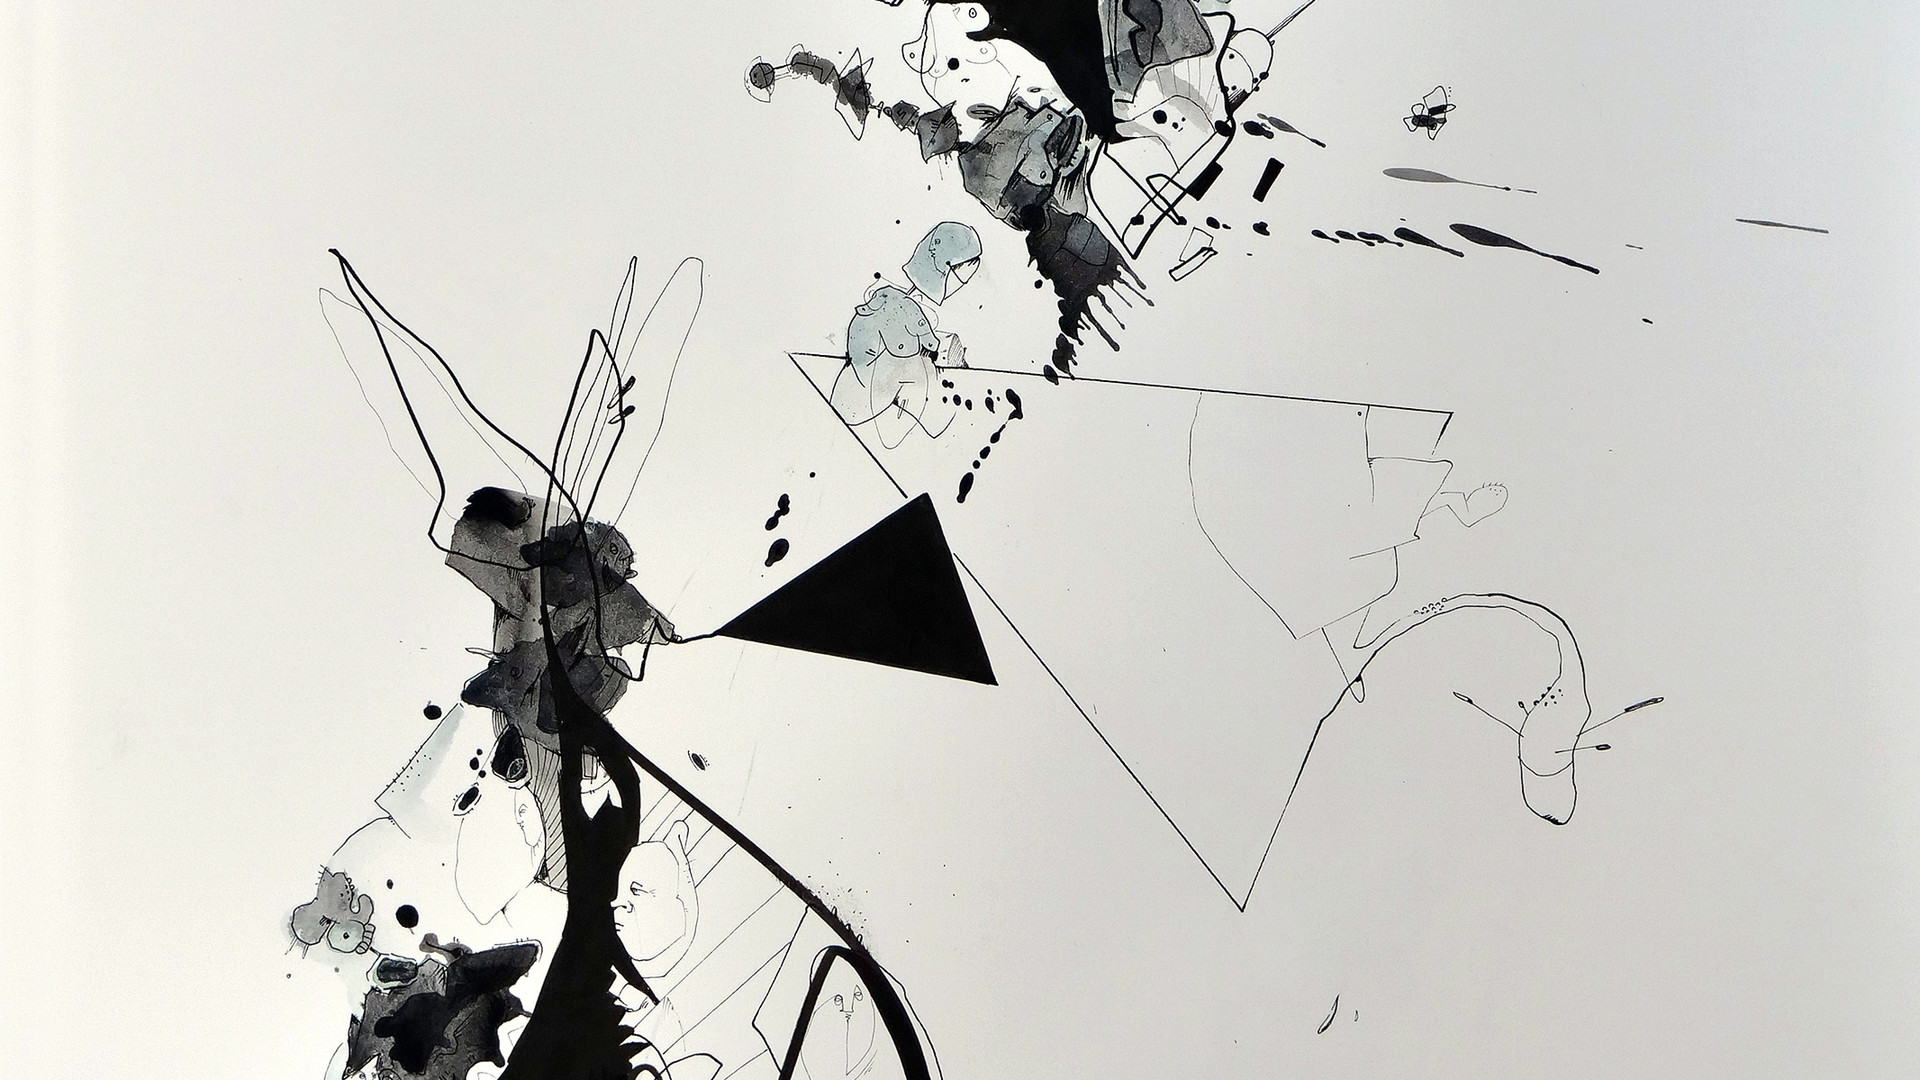 Peer Kriesel Frost 2018 Aquarell, Acryl, Pigmenttusche auf Papier 61 x 46 cm